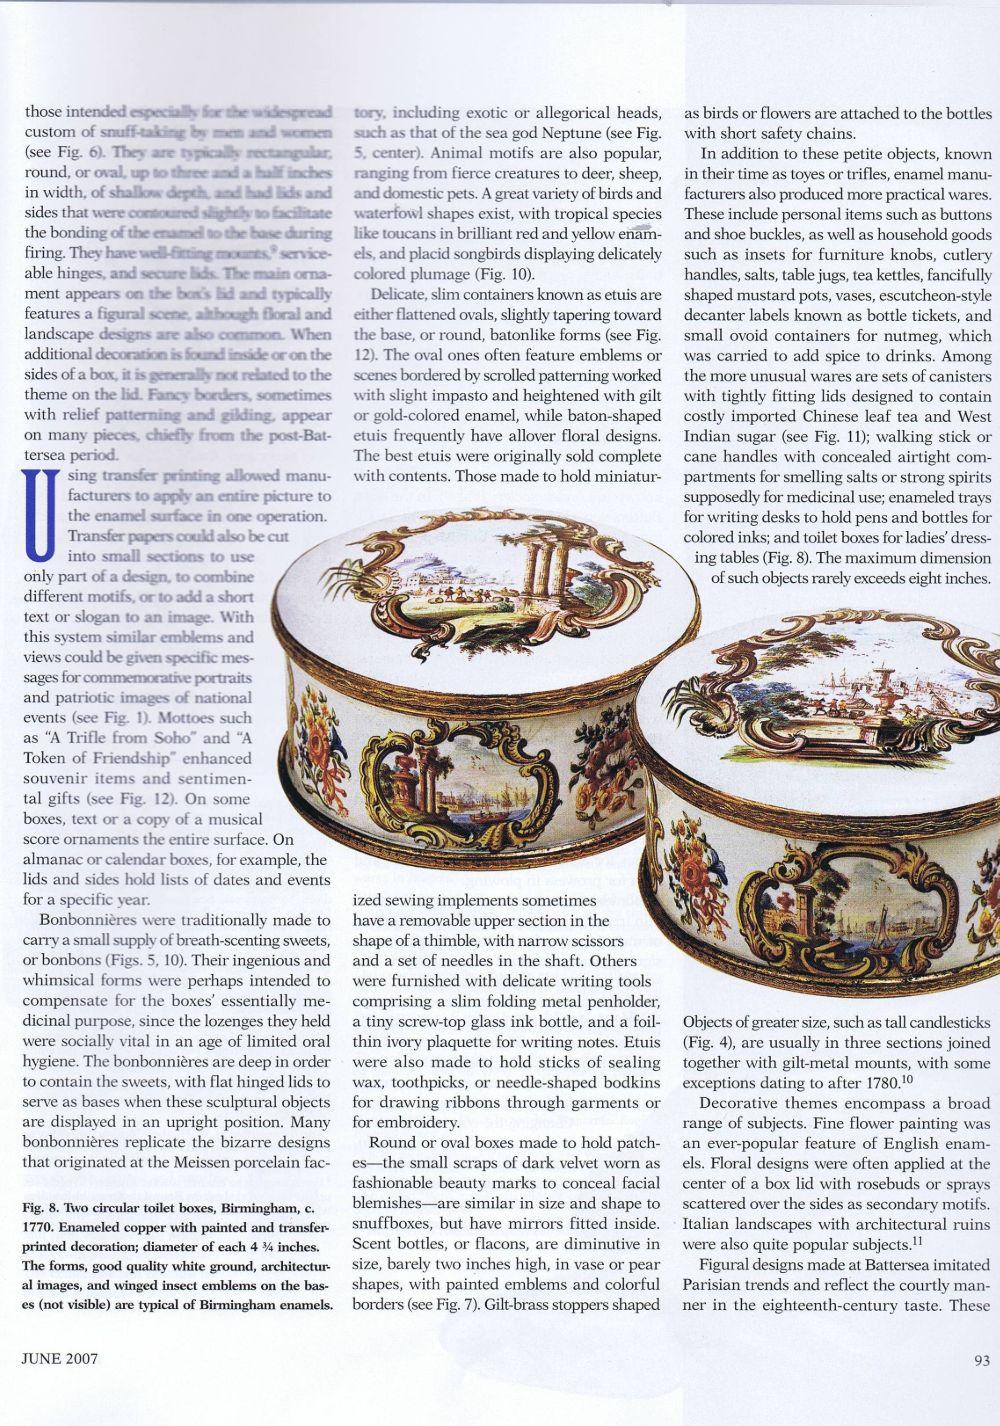 the magazine antiques07.6. June 2007